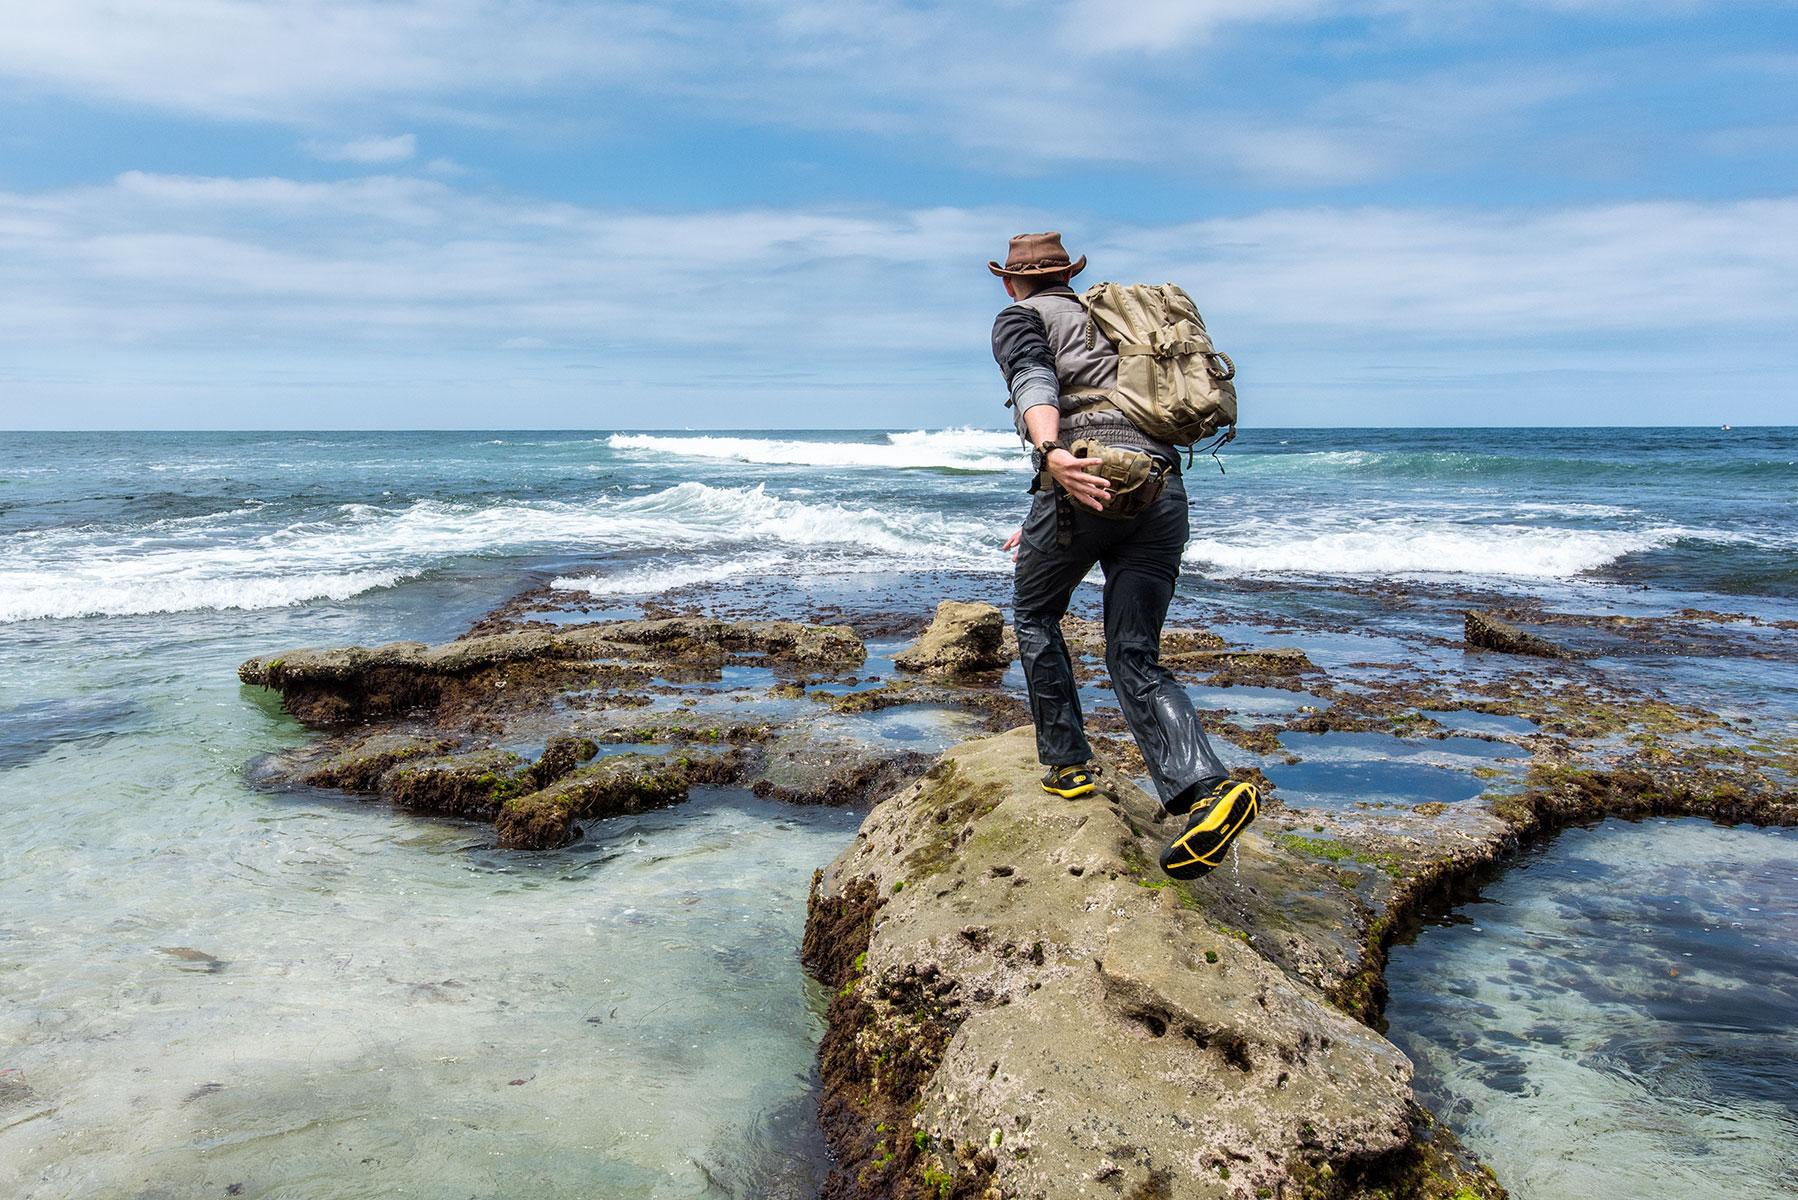 austin-trigg-brave-wilderness-la-jolla-california-keen-water-shoes.jpg